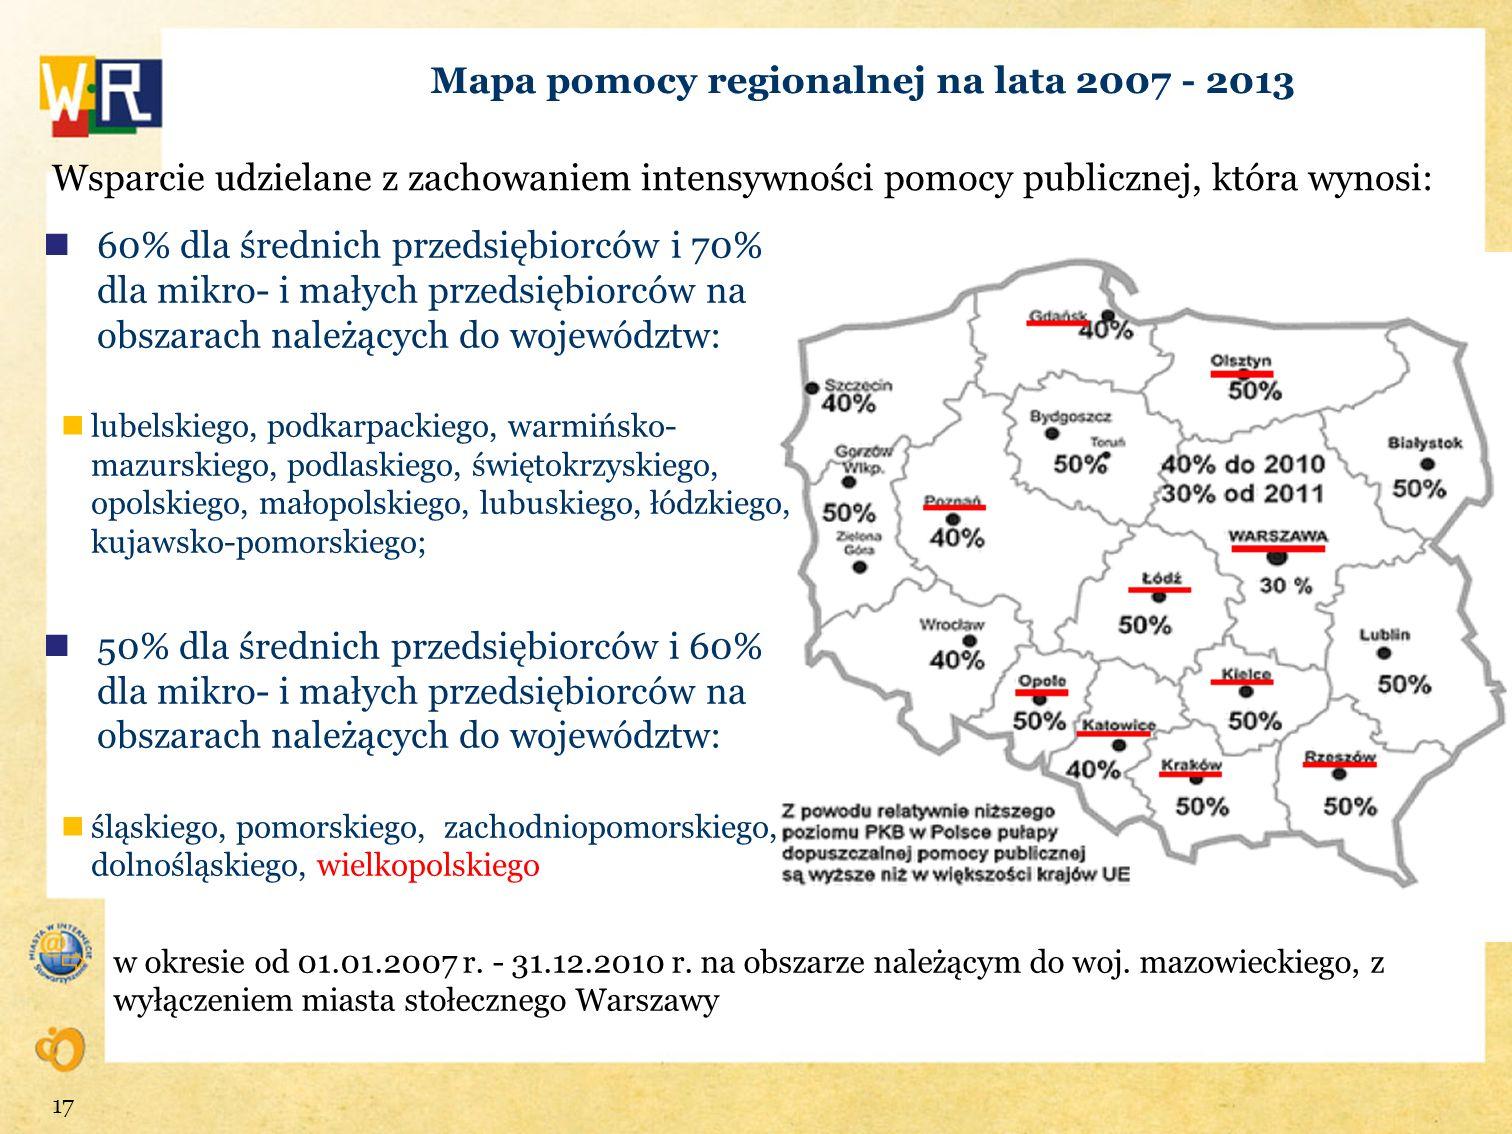 Mapa pomocy regionalnej na lata 2007 - 2013